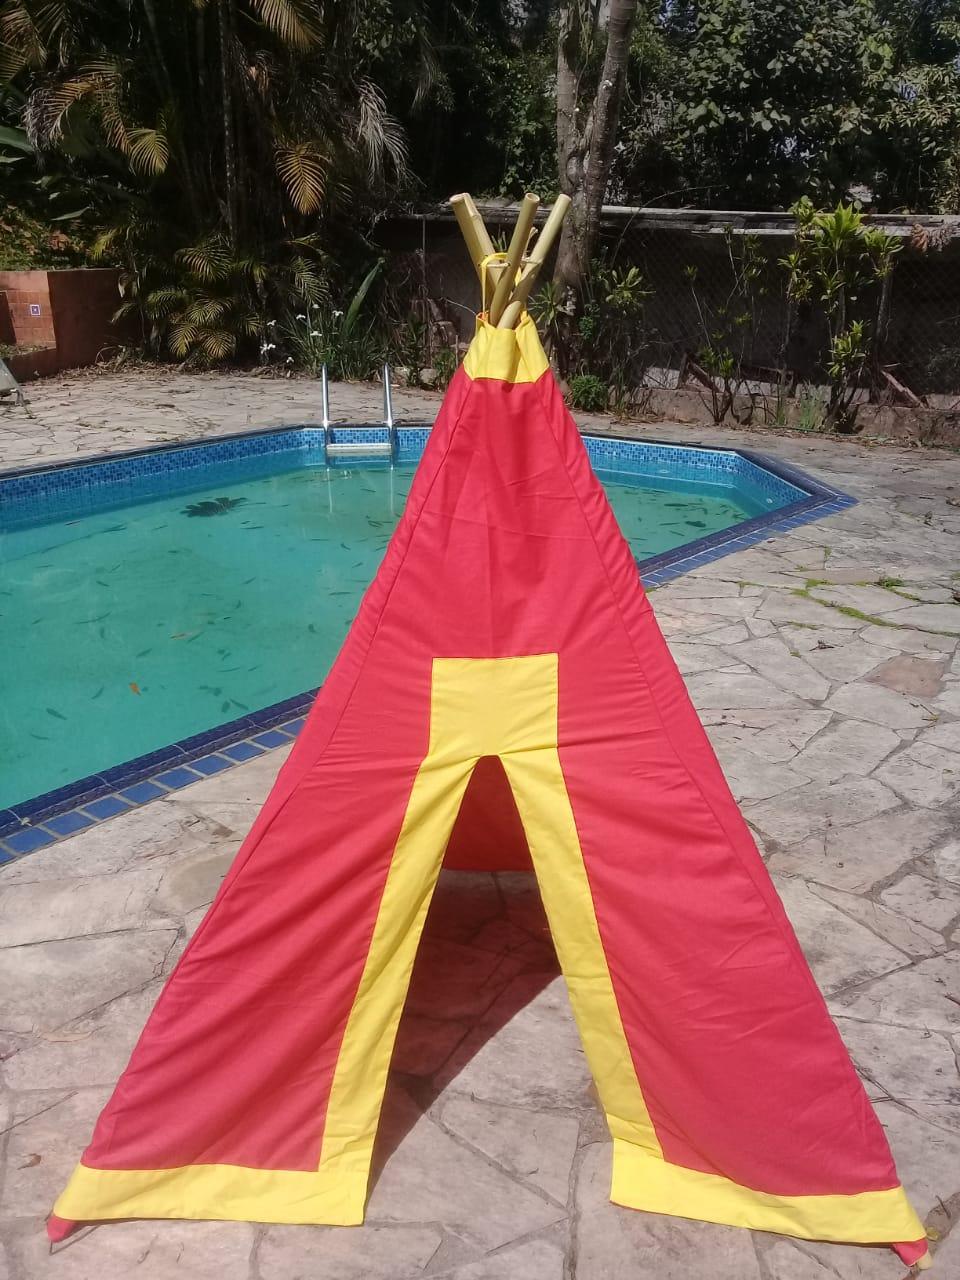 Barraca Tenda de Índio Colorida Vermelha